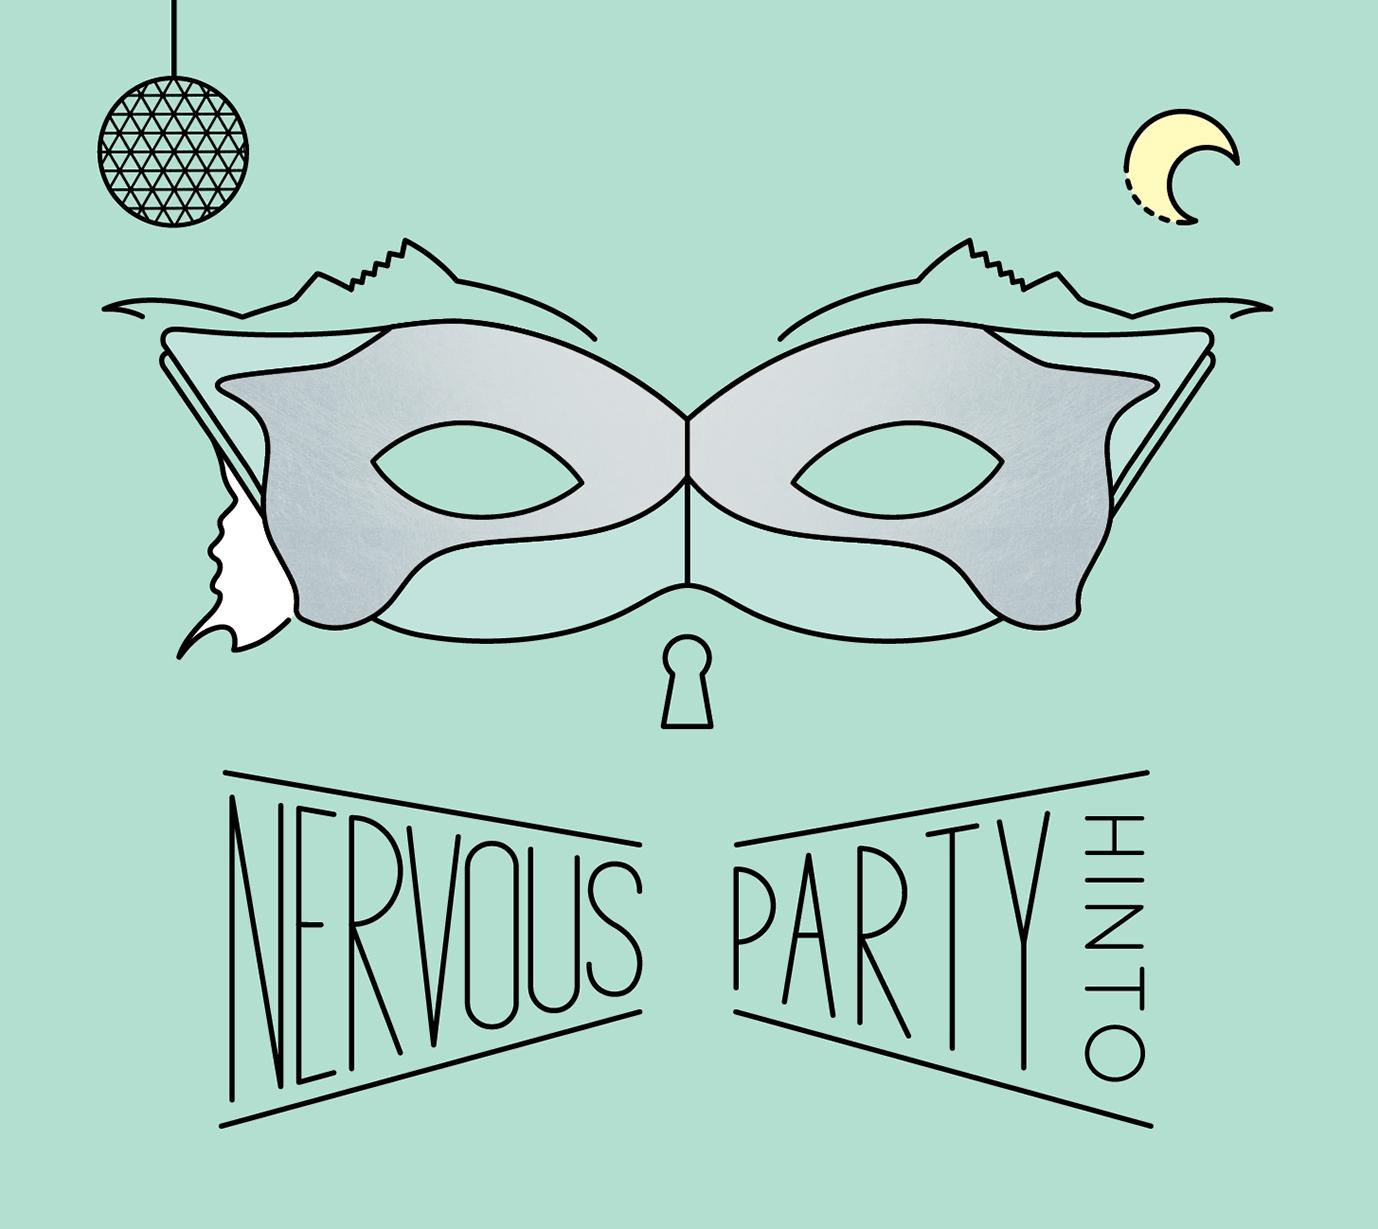 2nd full album「NERVOUS PARTY」